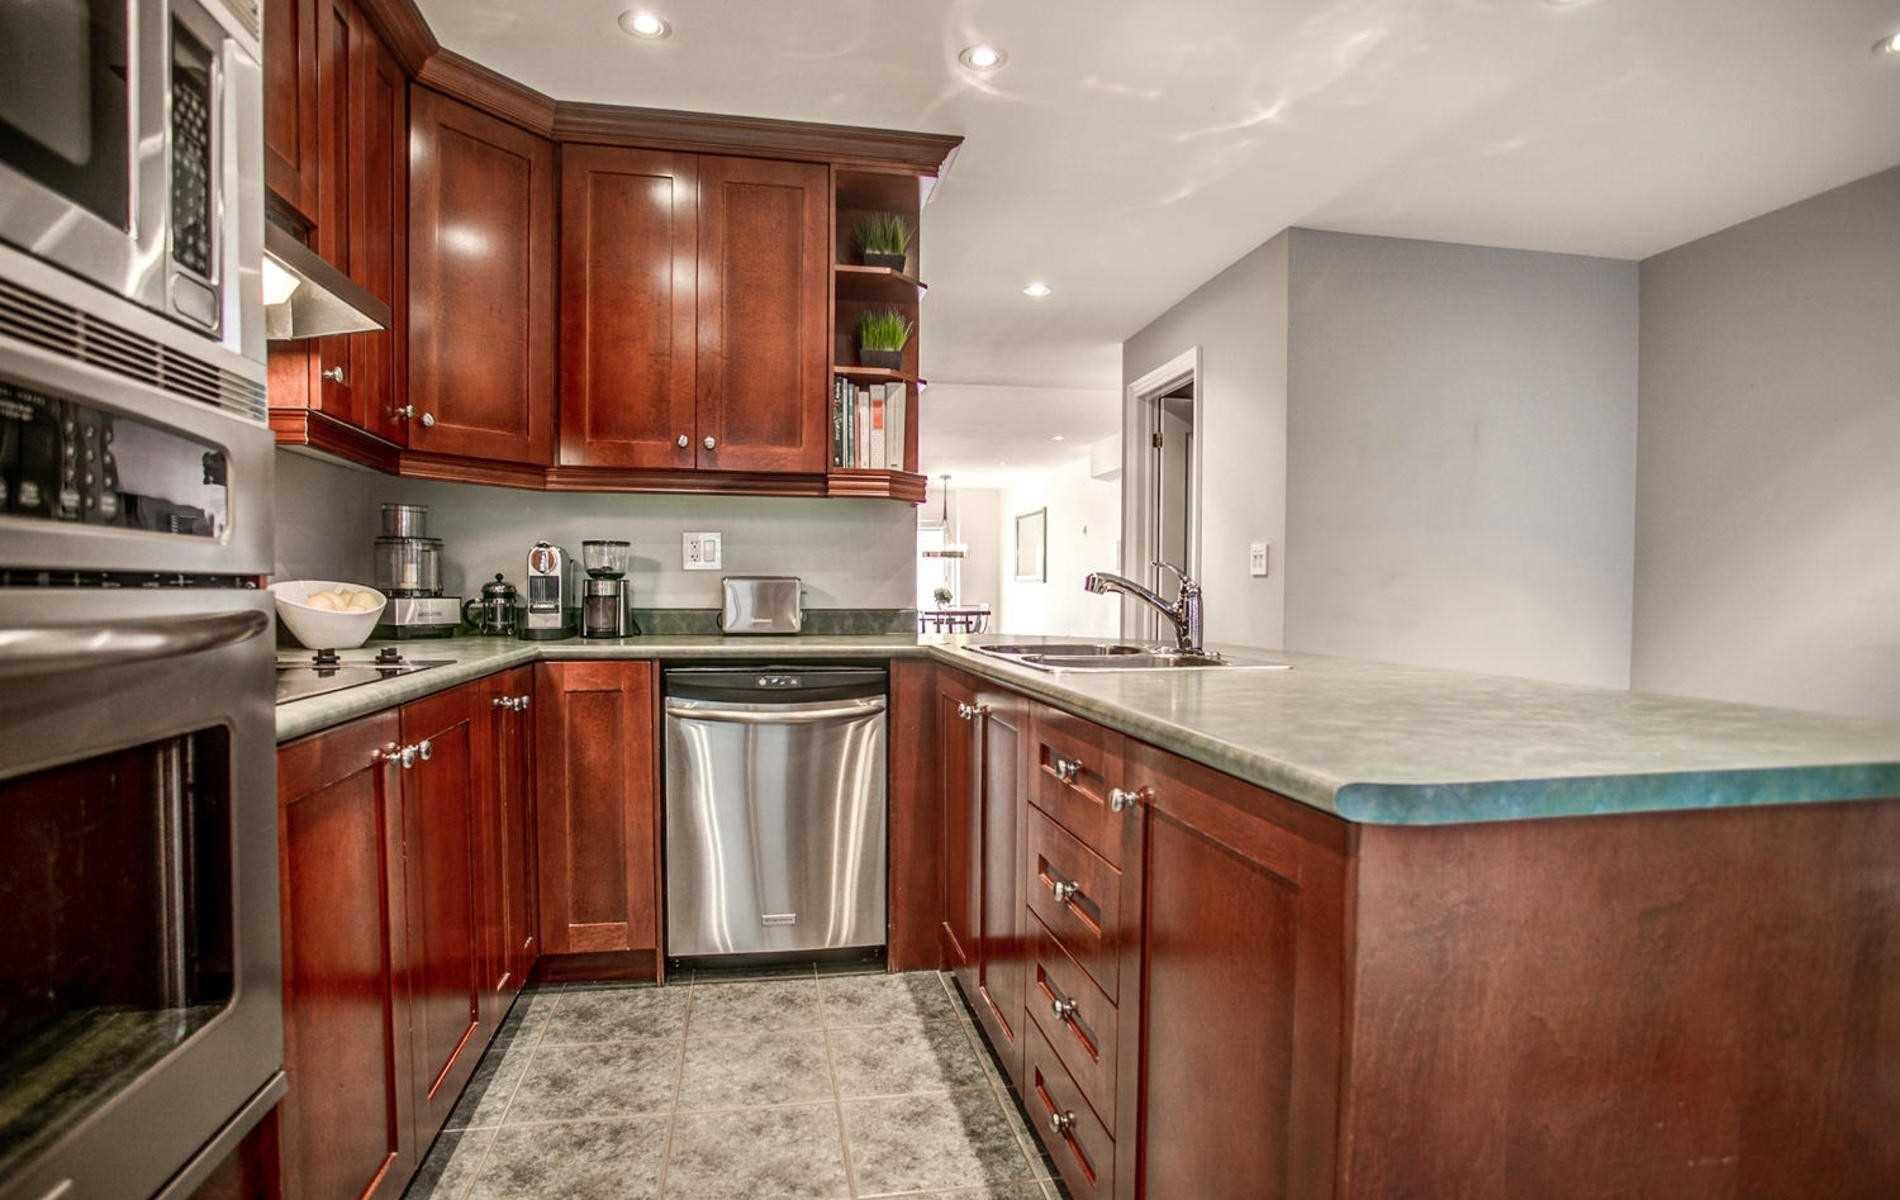 Photo 7: Photos: 119 Carlaw Avenue in Toronto: South Riverdale House (3-Storey) for lease (Toronto E01)  : MLS®# E4386176